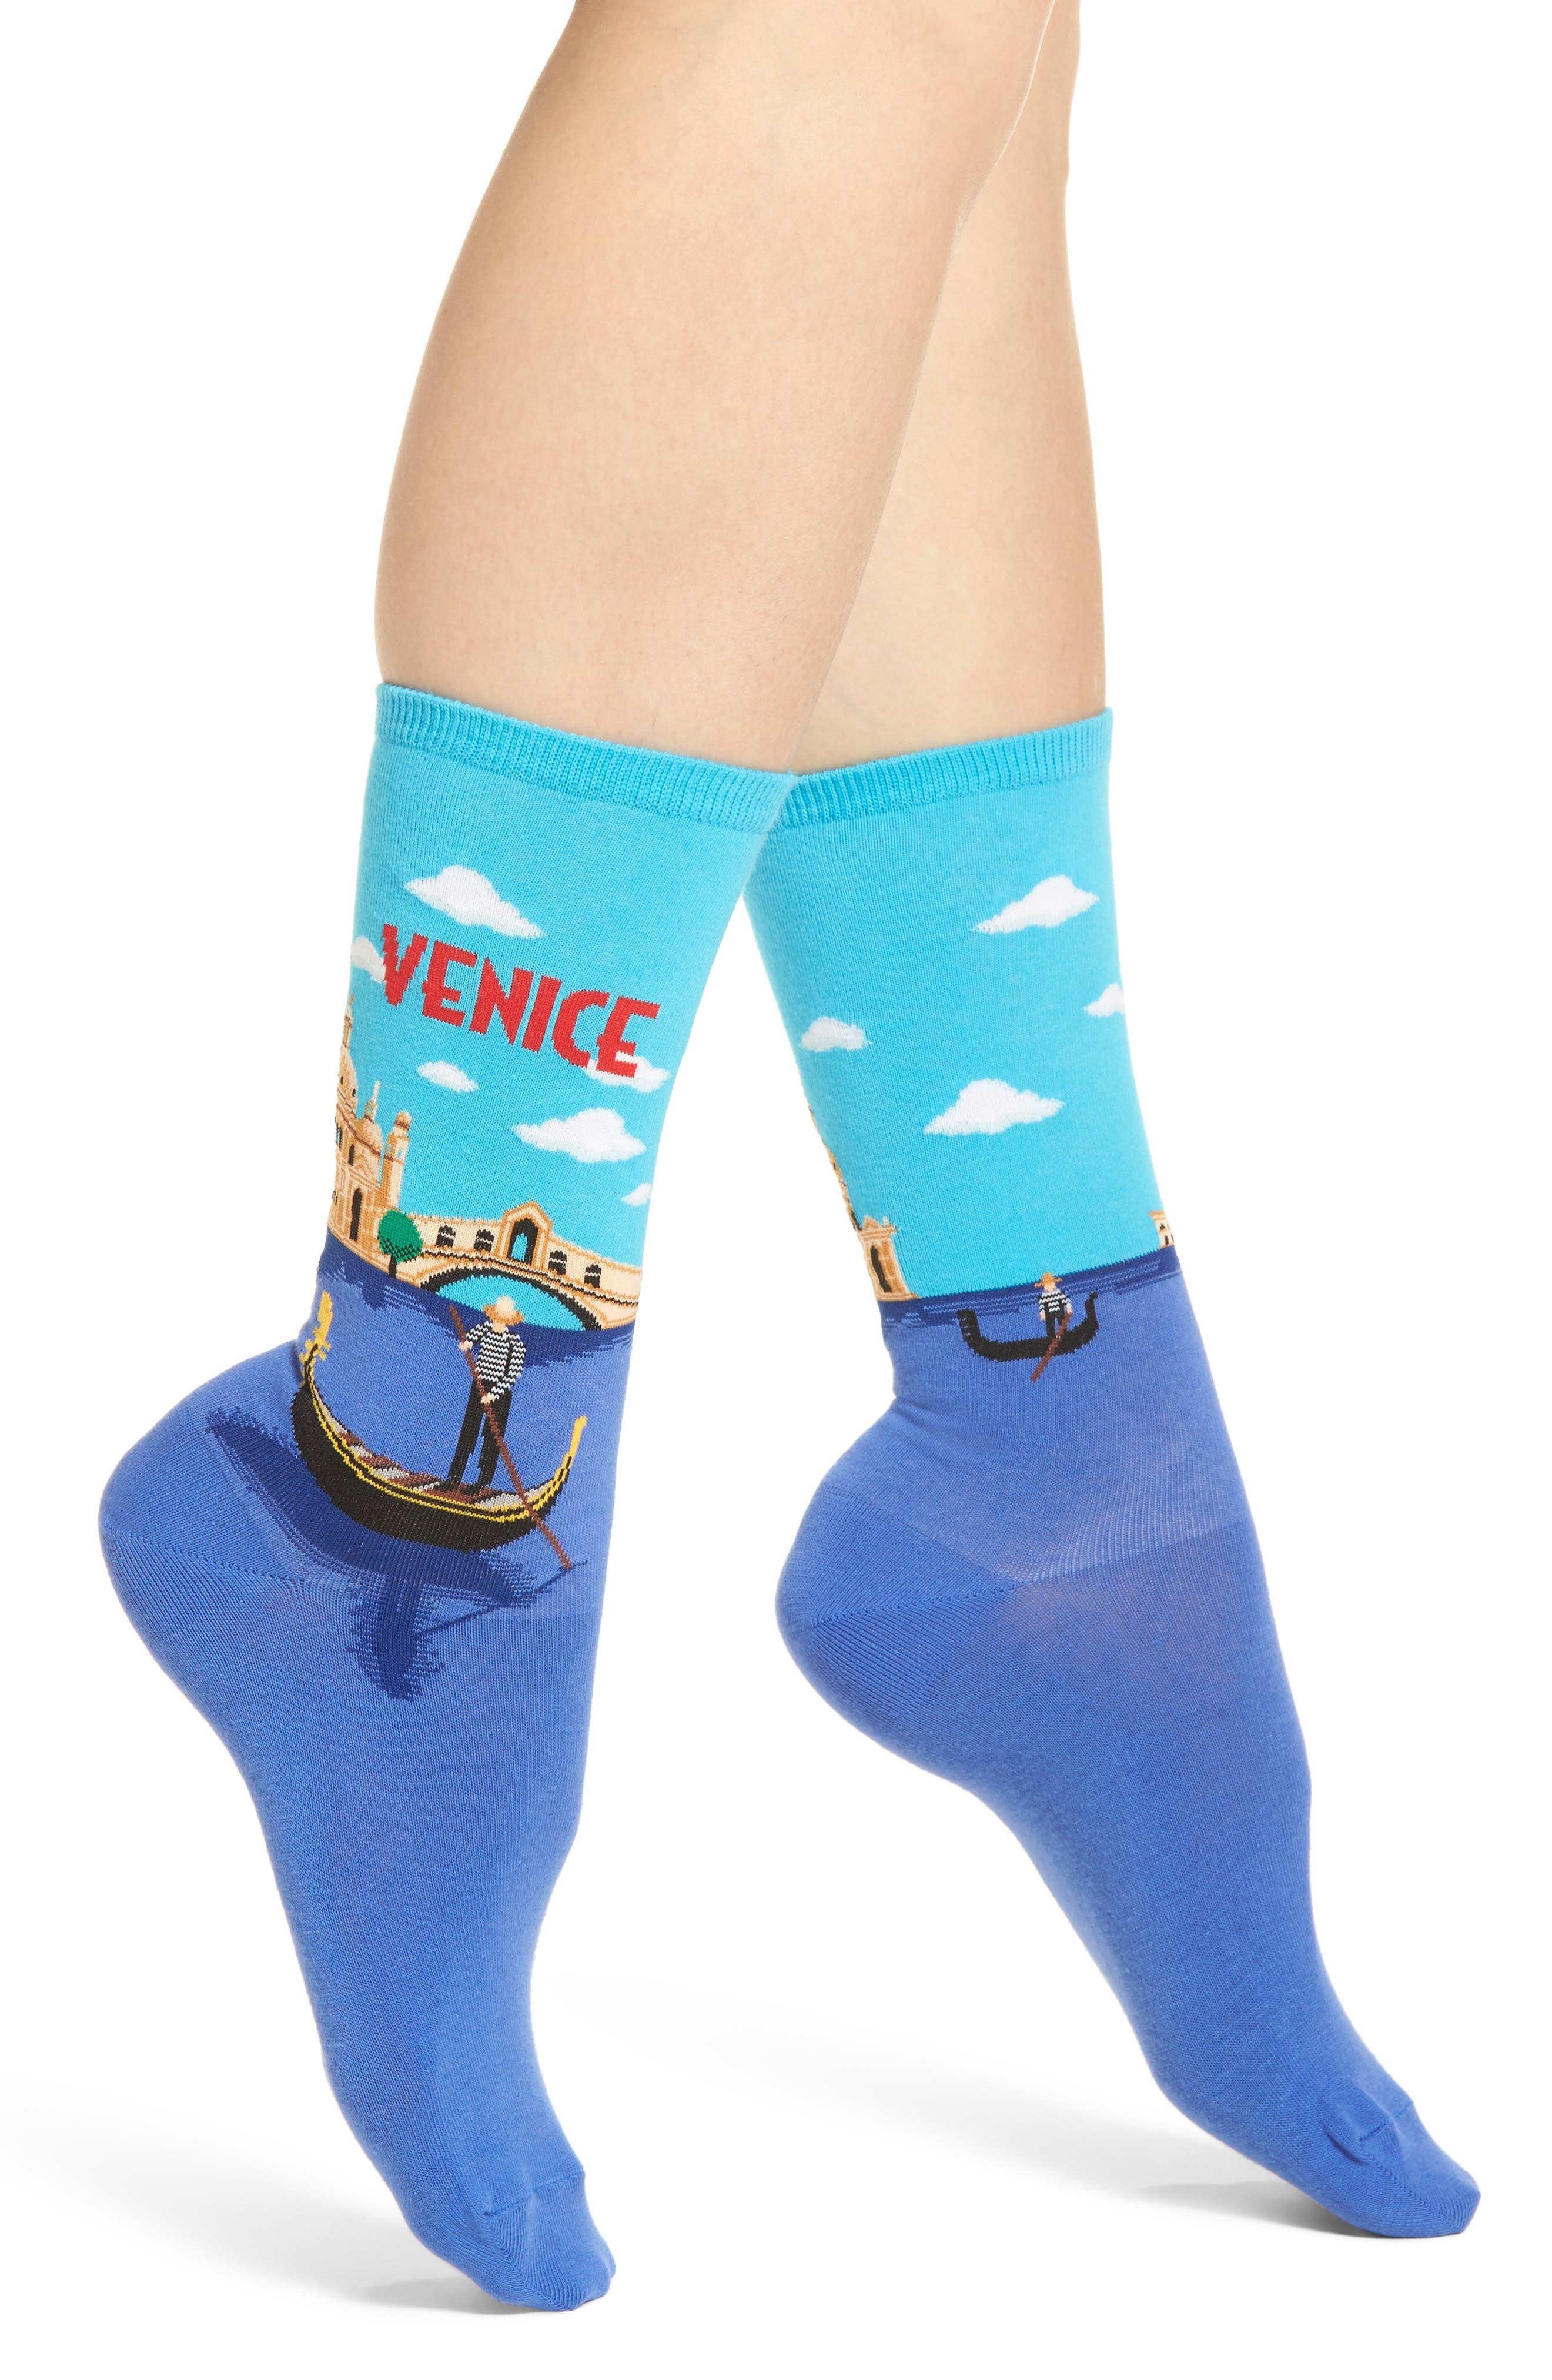 Travel Series - Venice Crew Socks,                             Main thumbnail 1, color,                             468